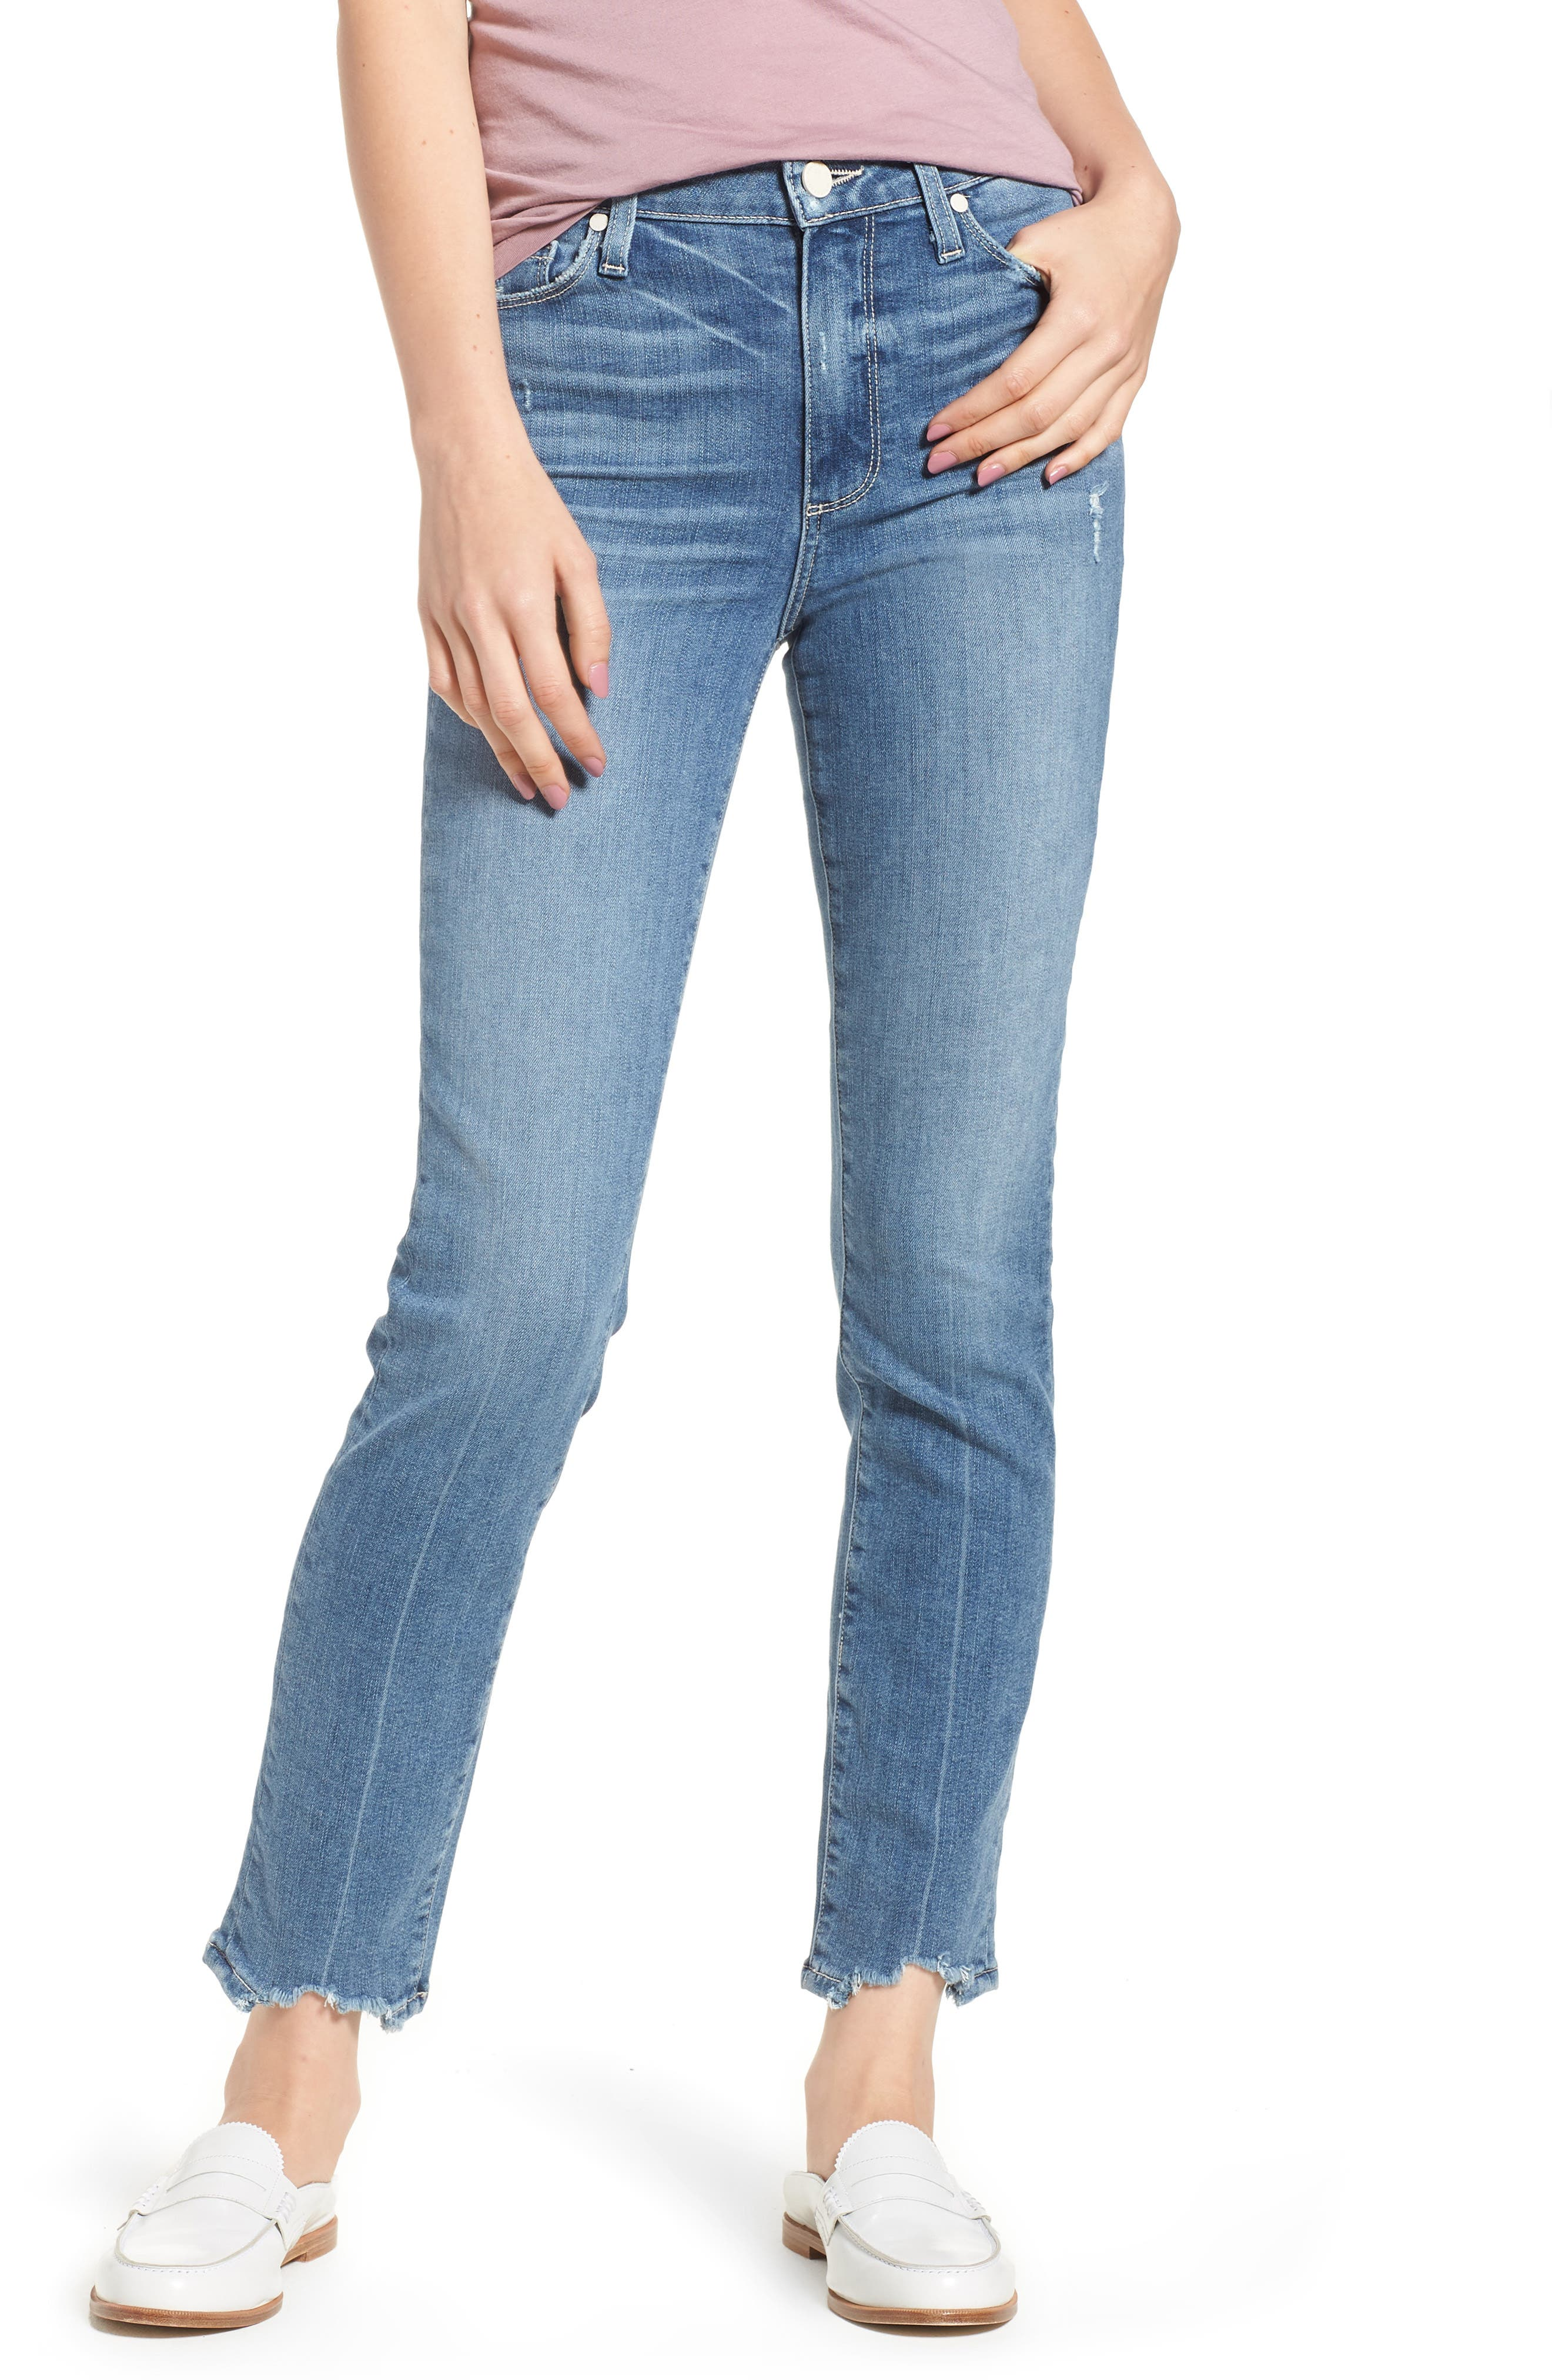 Transcend Vintage - Hoxton High Waist Ankle Skinny Jeans,                             Main thumbnail 1, color,                             400